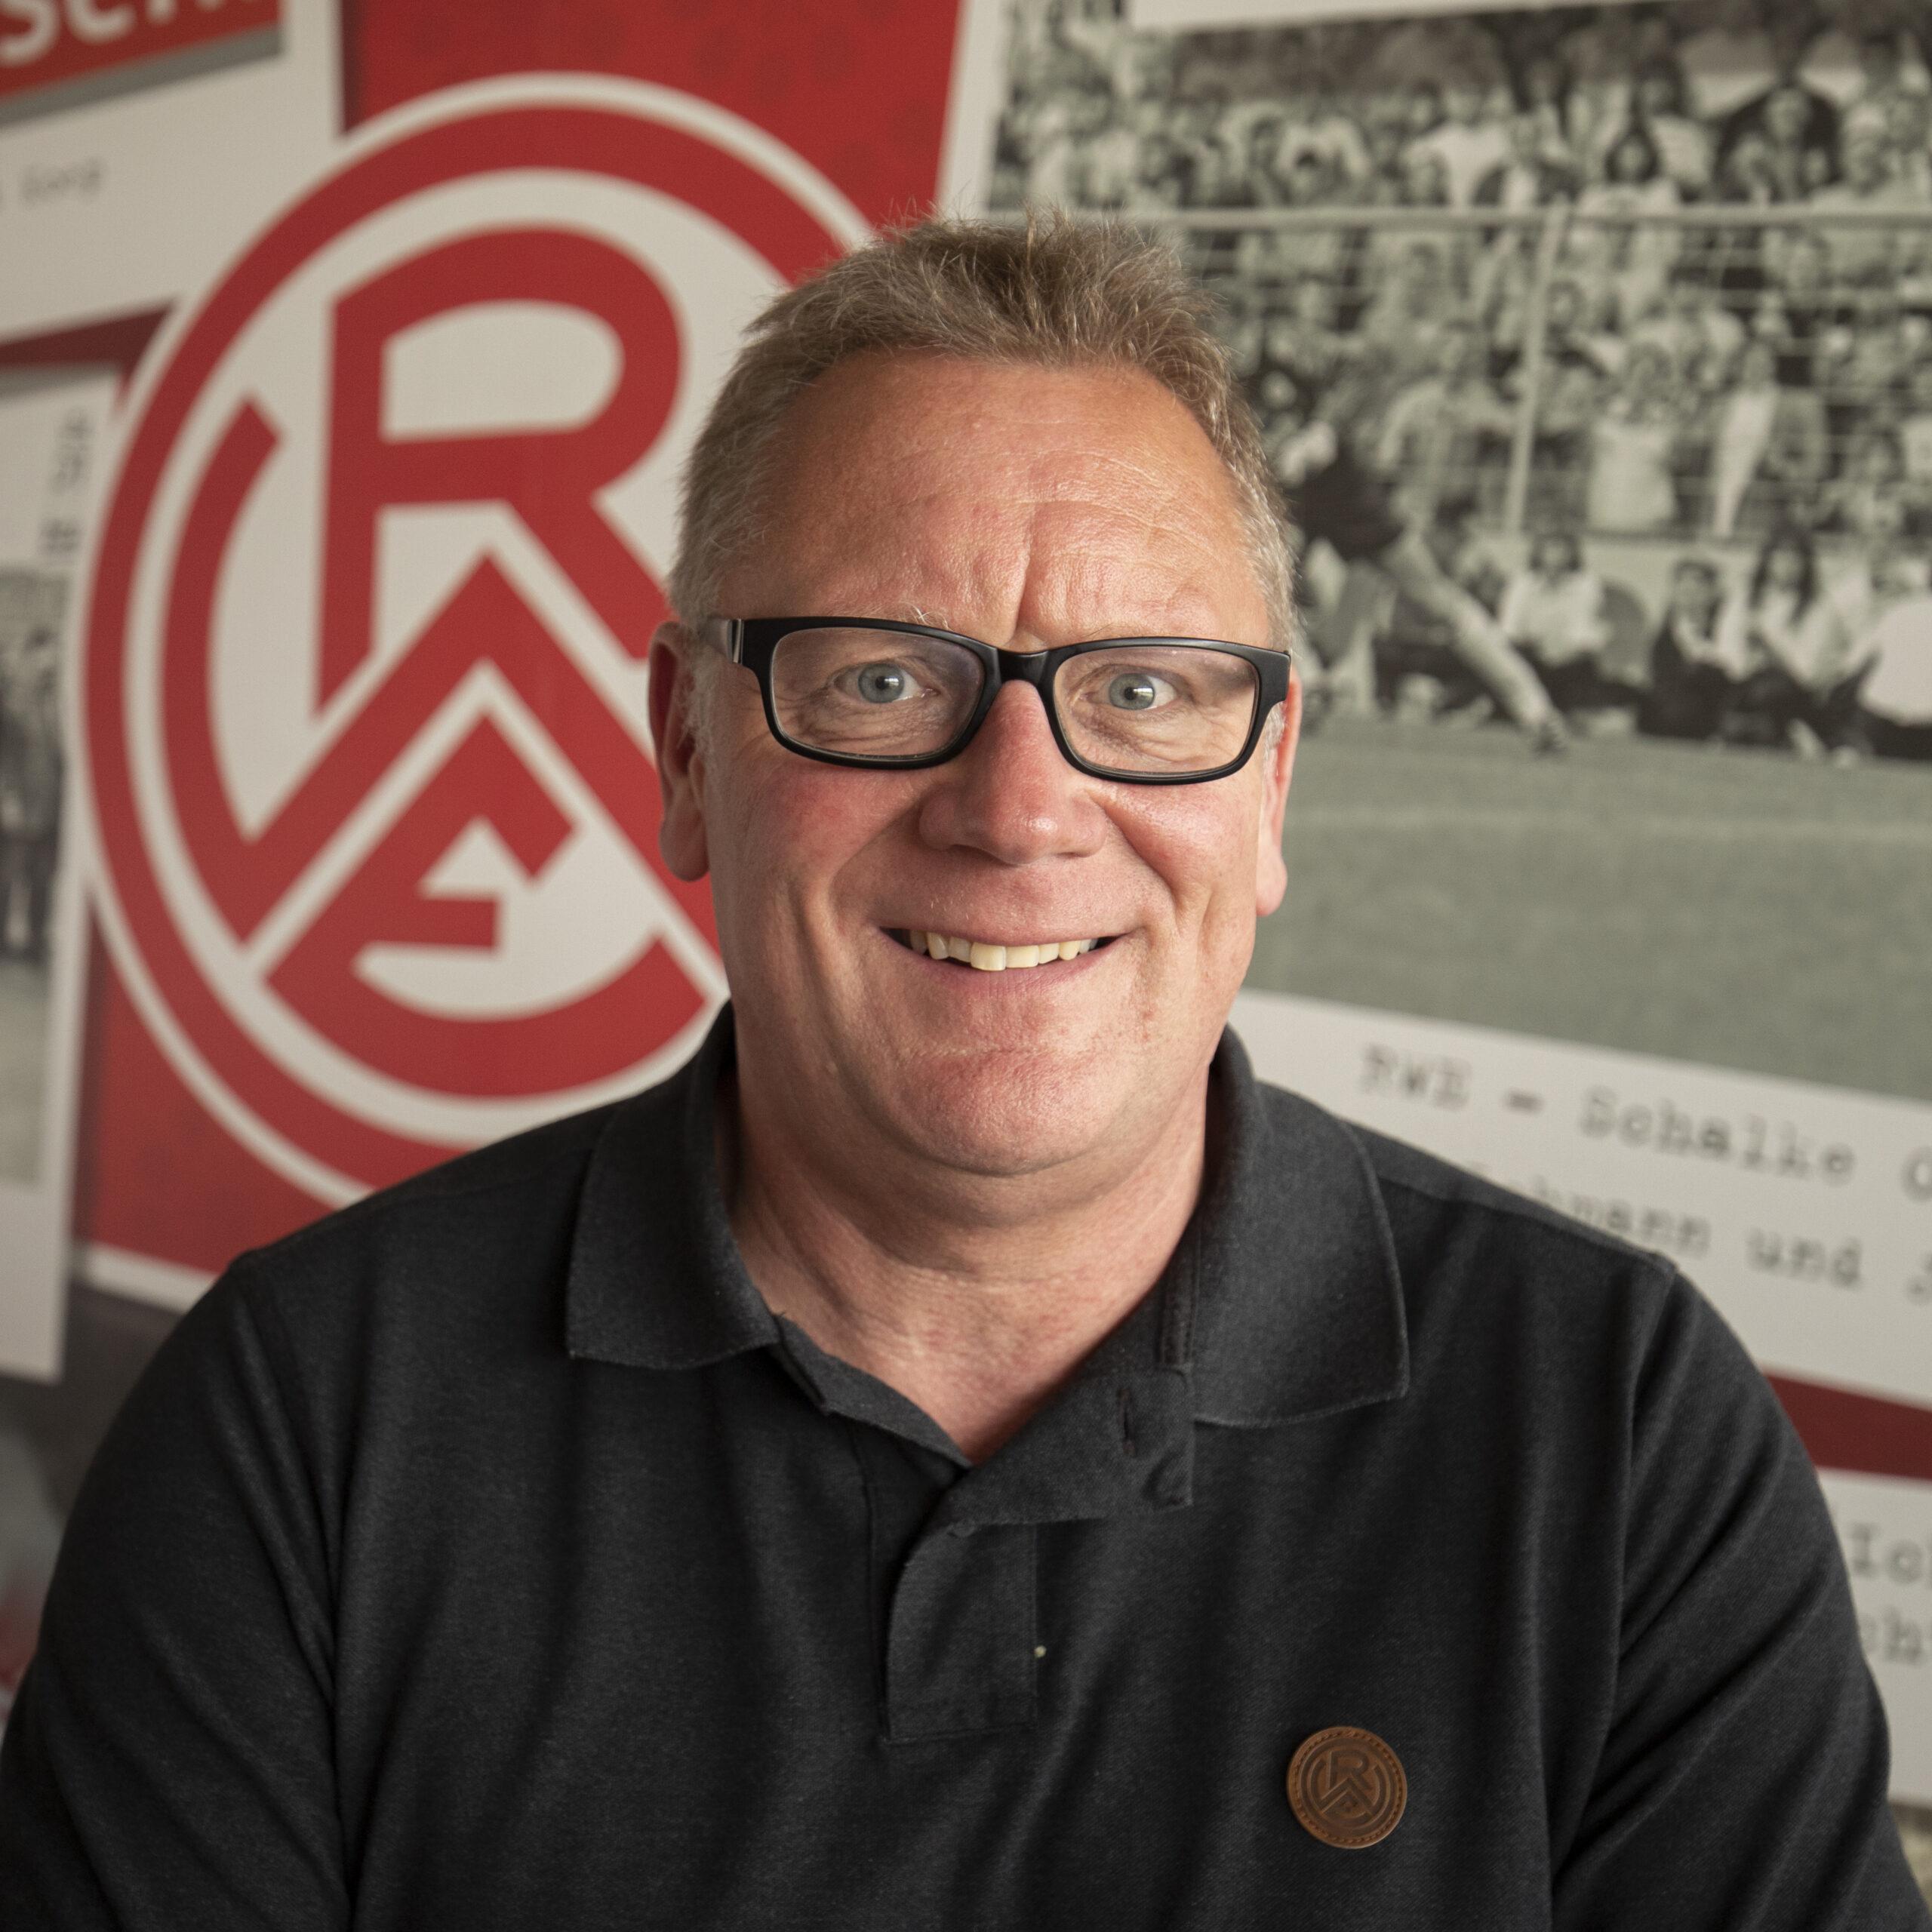 Dirk Kindsgrab – Rot-Weiss Essen